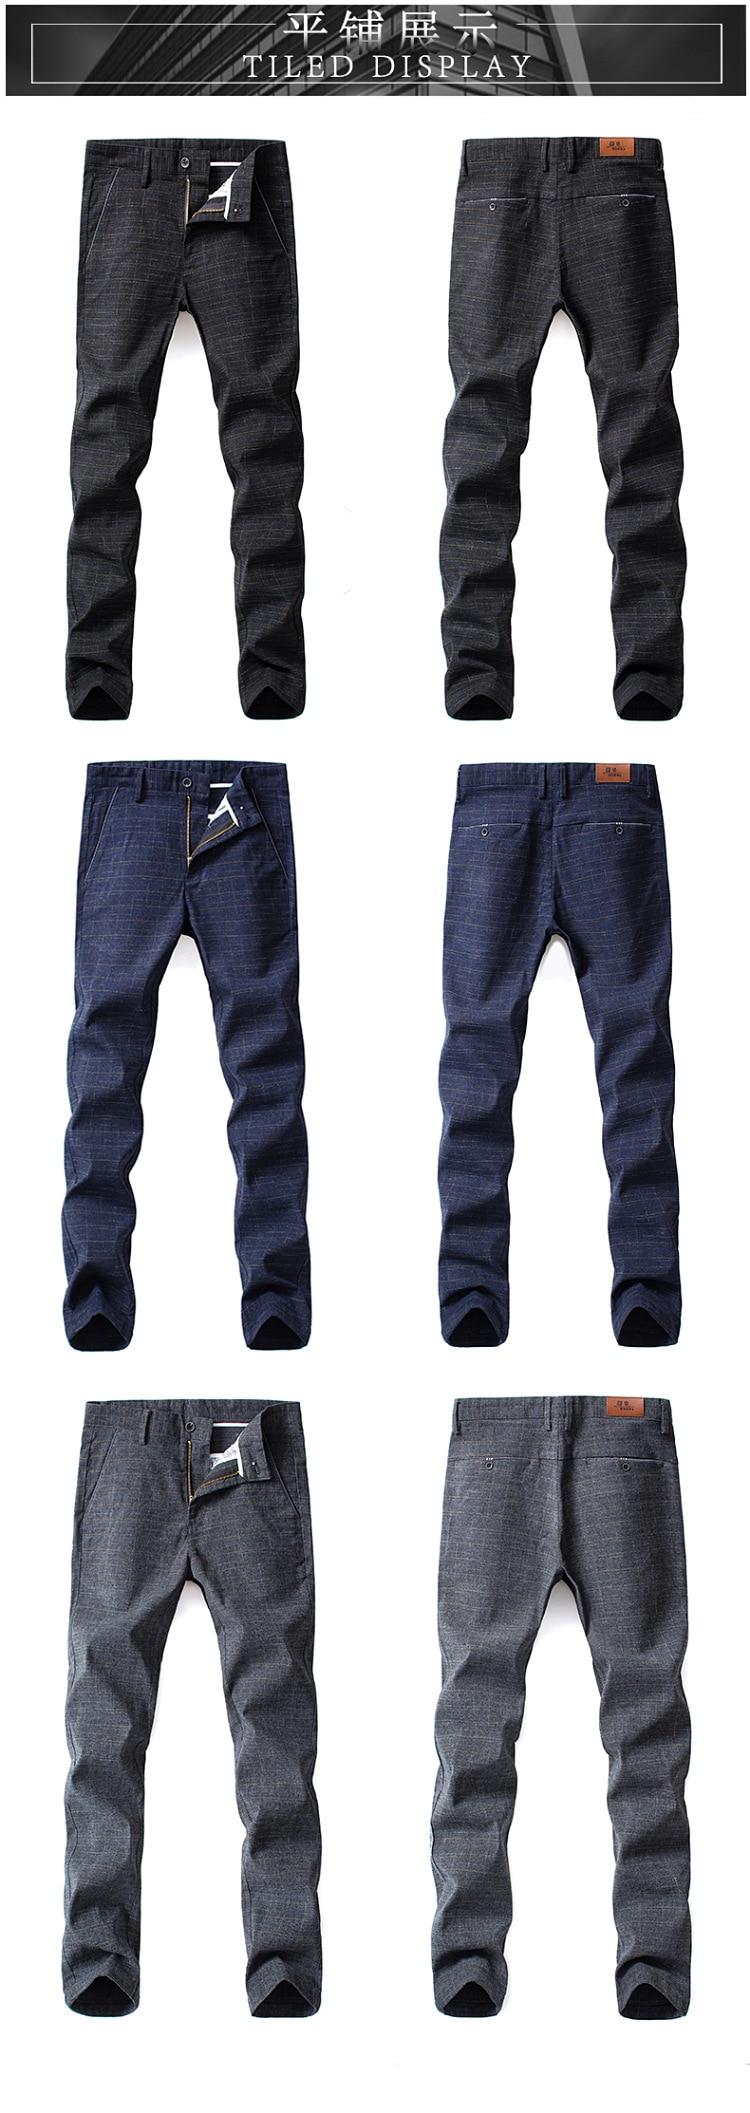 2019 Men's Stretch Stripe Casual Pants Men's Four Seasons High Quality Business Trousers Men's Straight Trousers Harem Pants